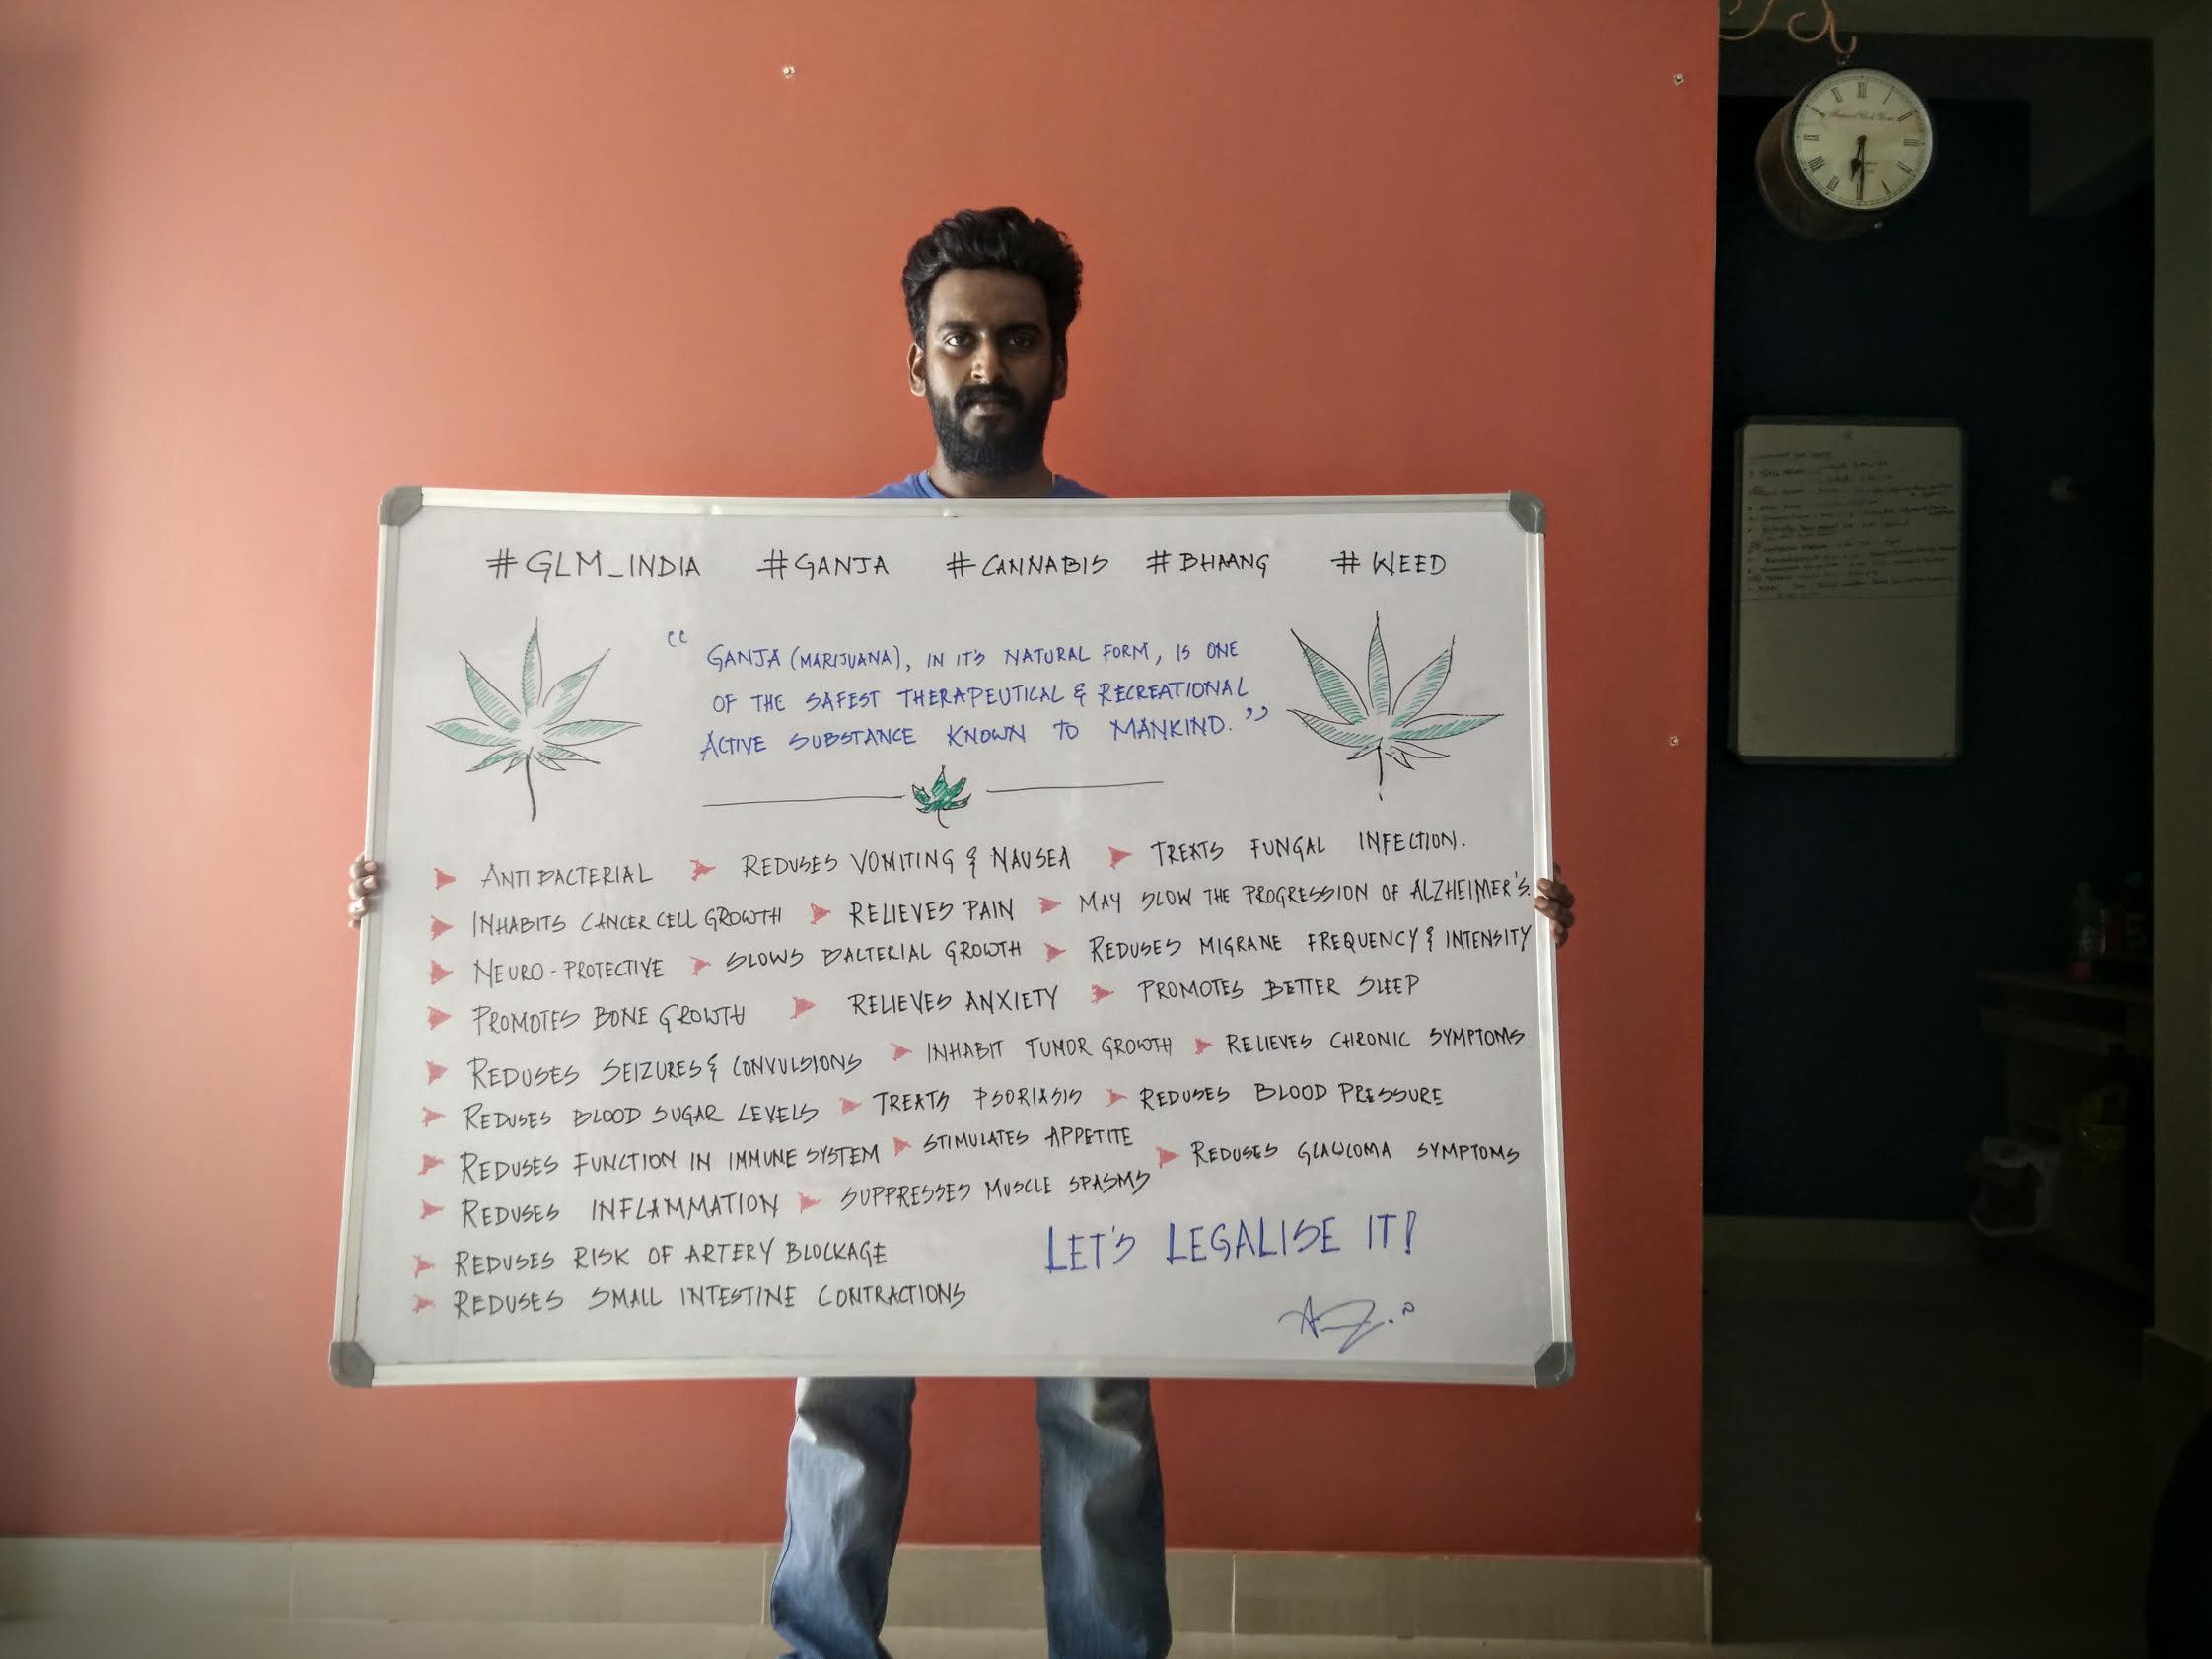 india-demands-017.jpg